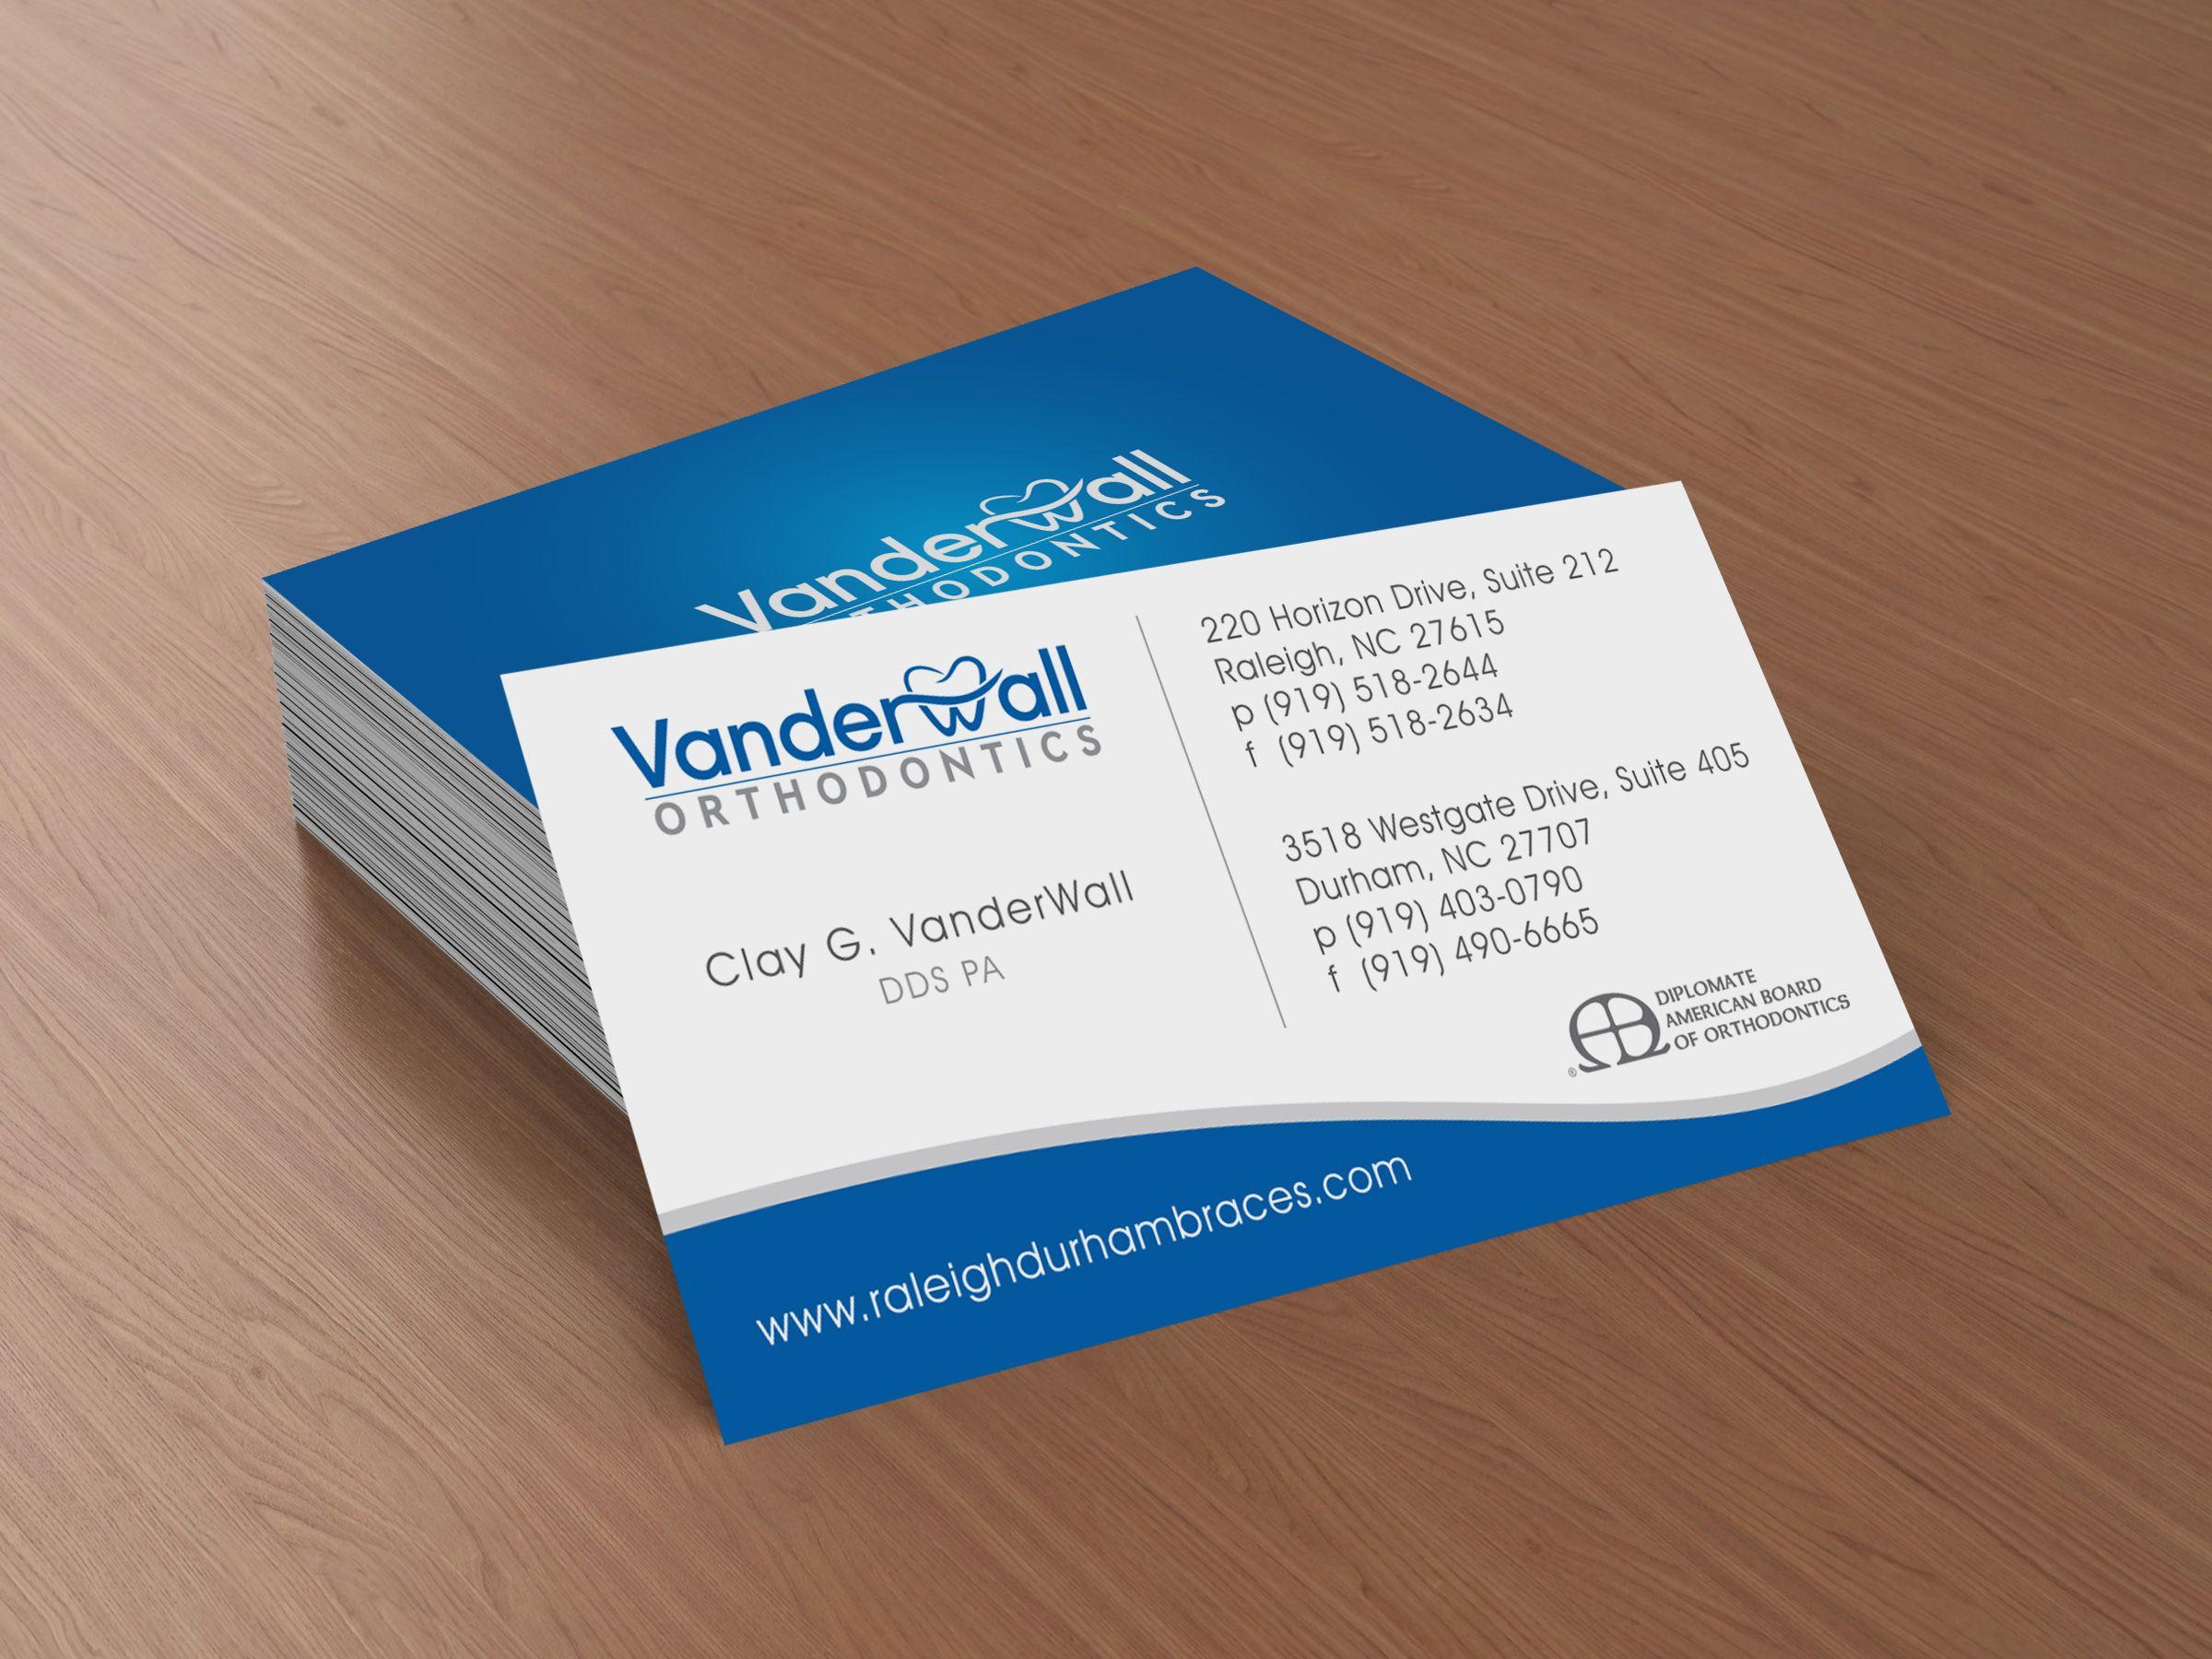 Business card design vanderwall orthodontics raleigh nc by redwood business card design vanderwall orthodontics raleigh nc by redwood productions design print reheart Images